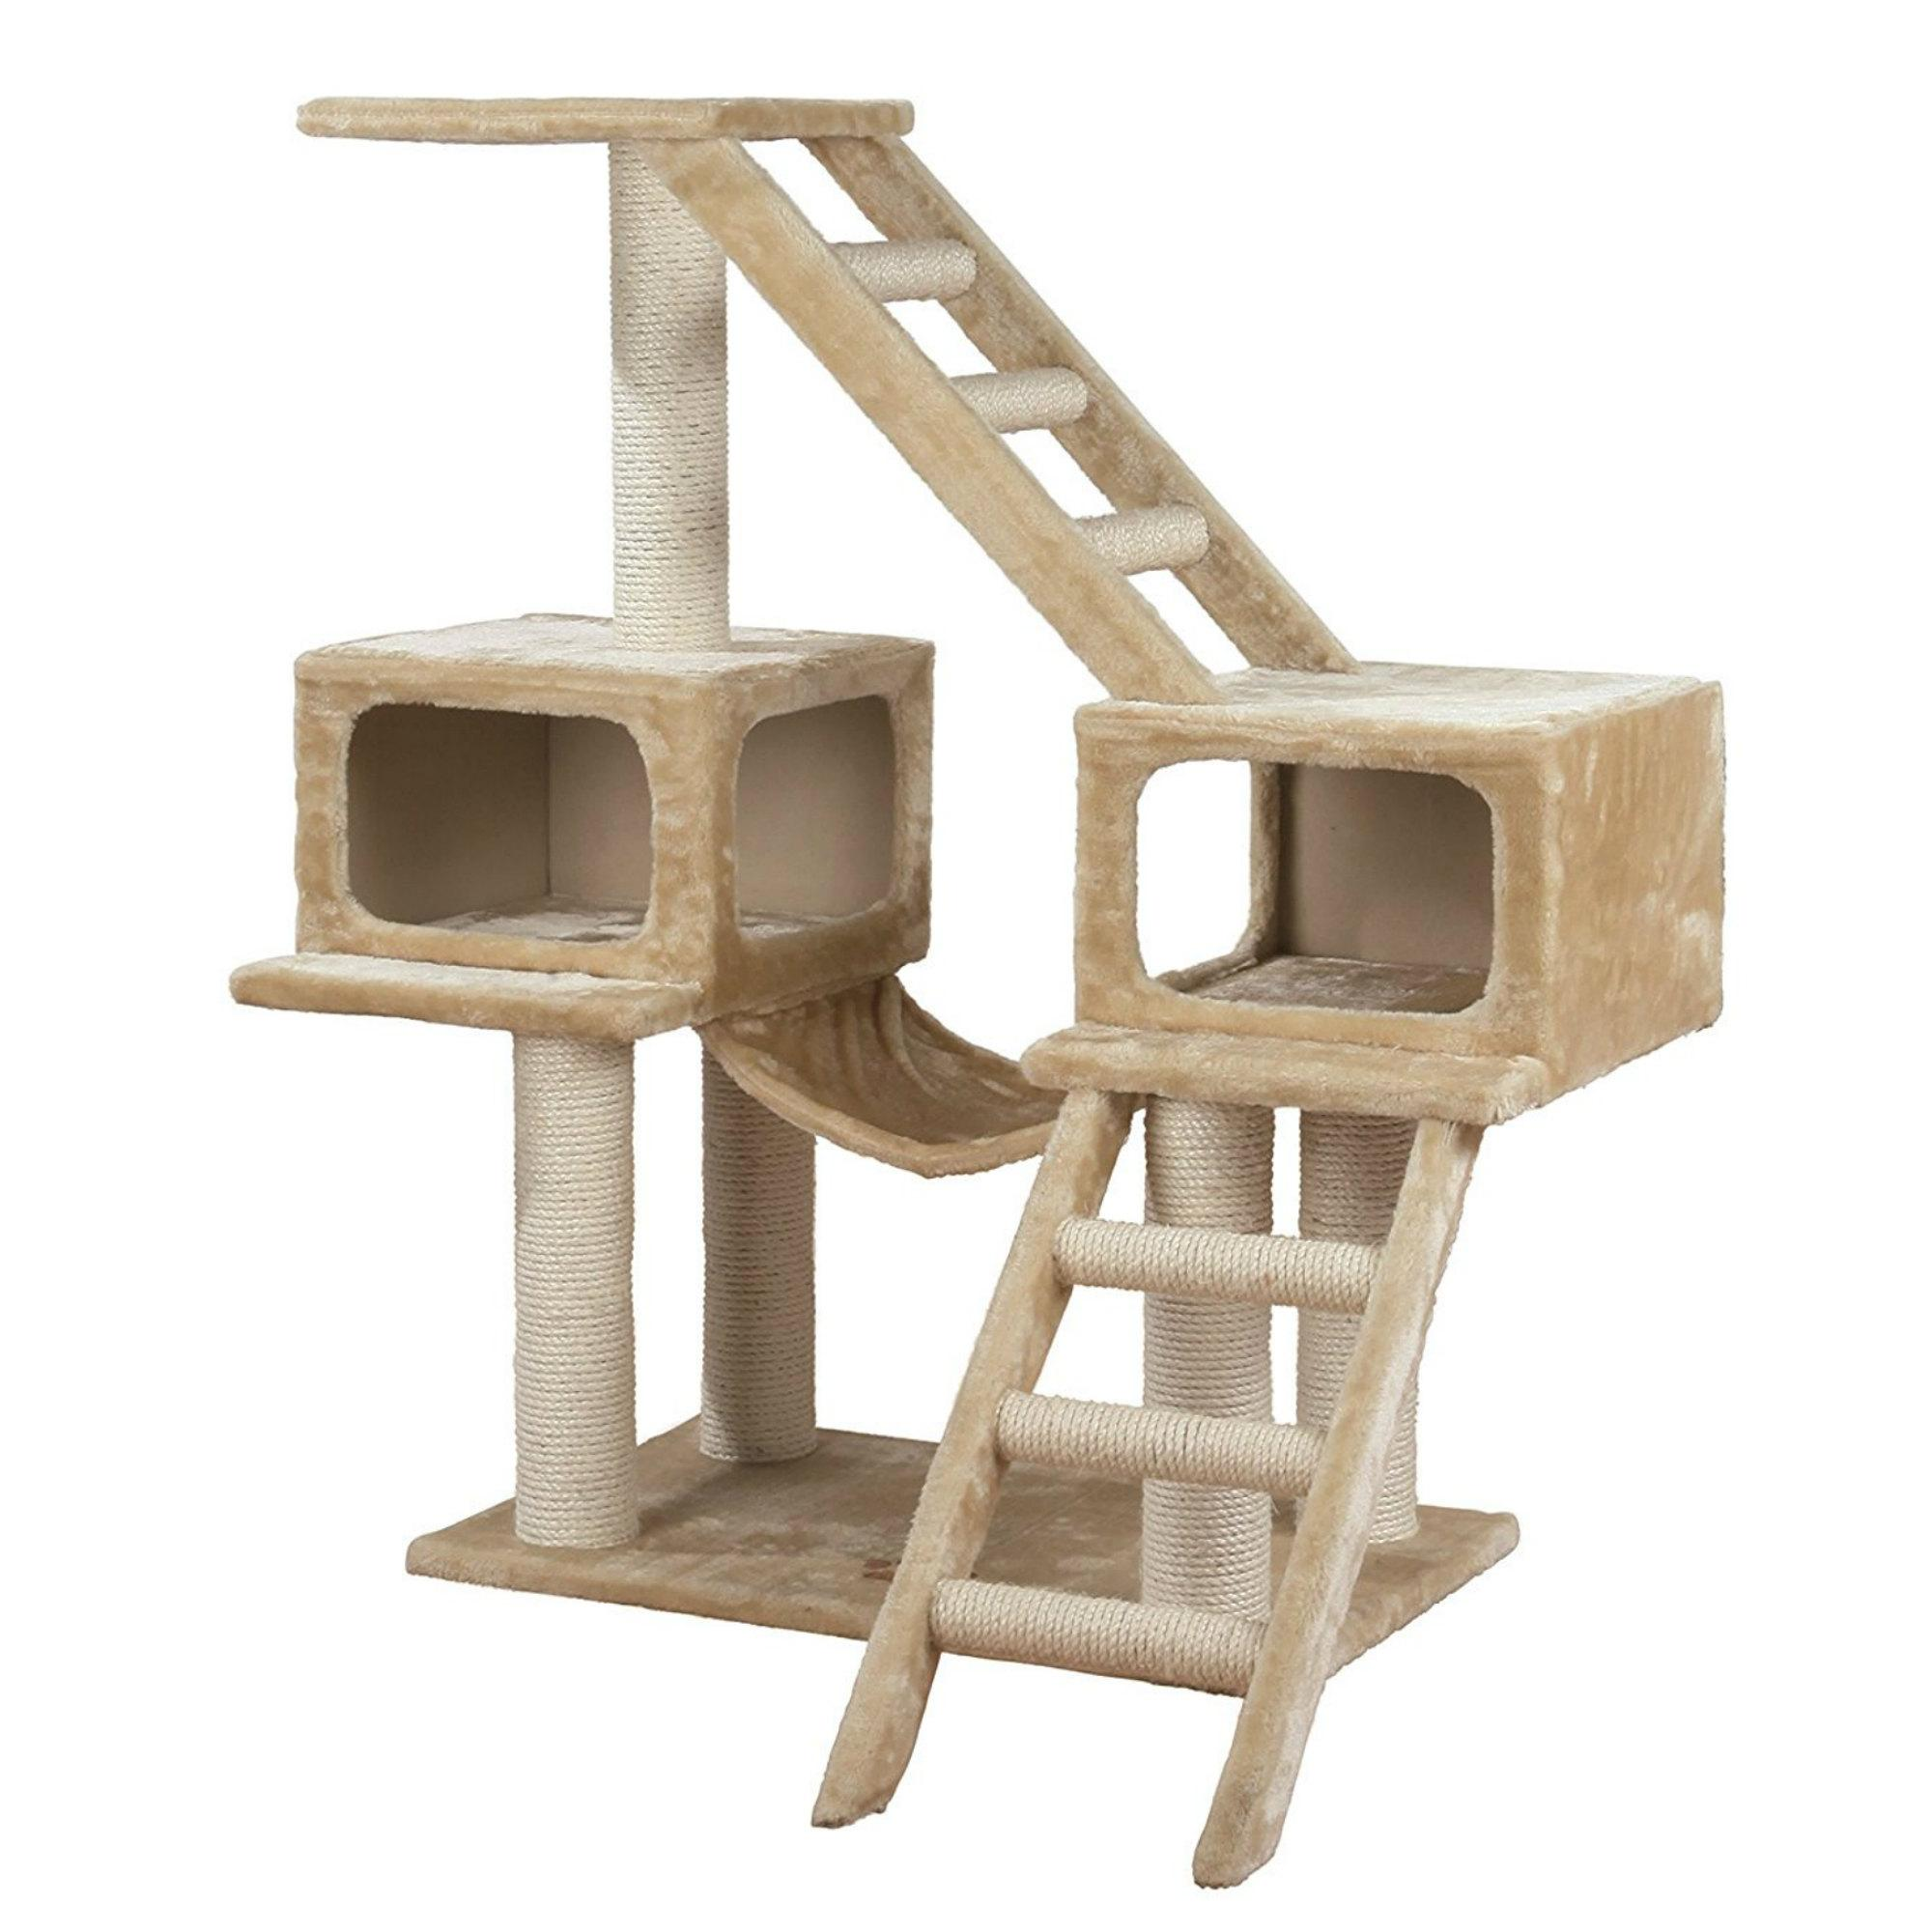 Trixie Malaga Cat Tree Playground - Beige